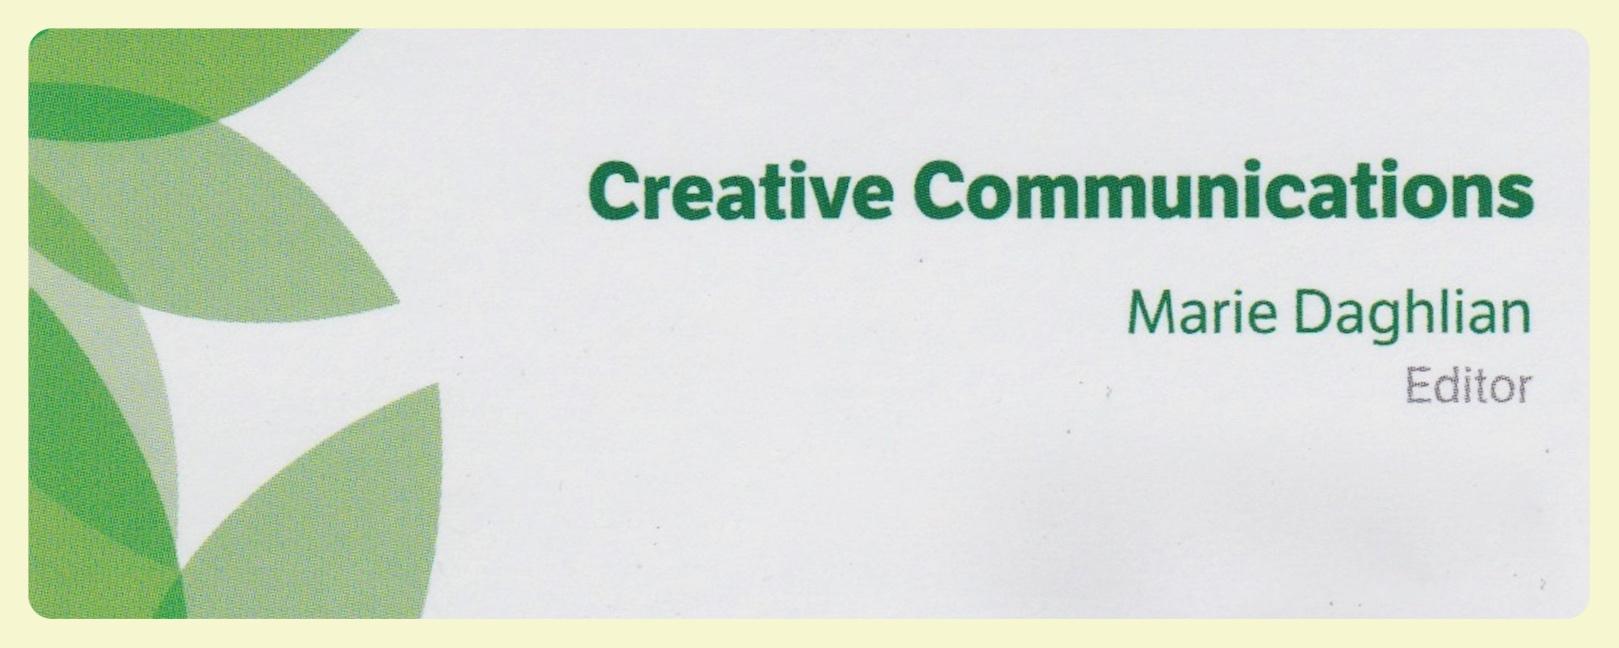 MarieCreativeCommunications_Fotor.jpg